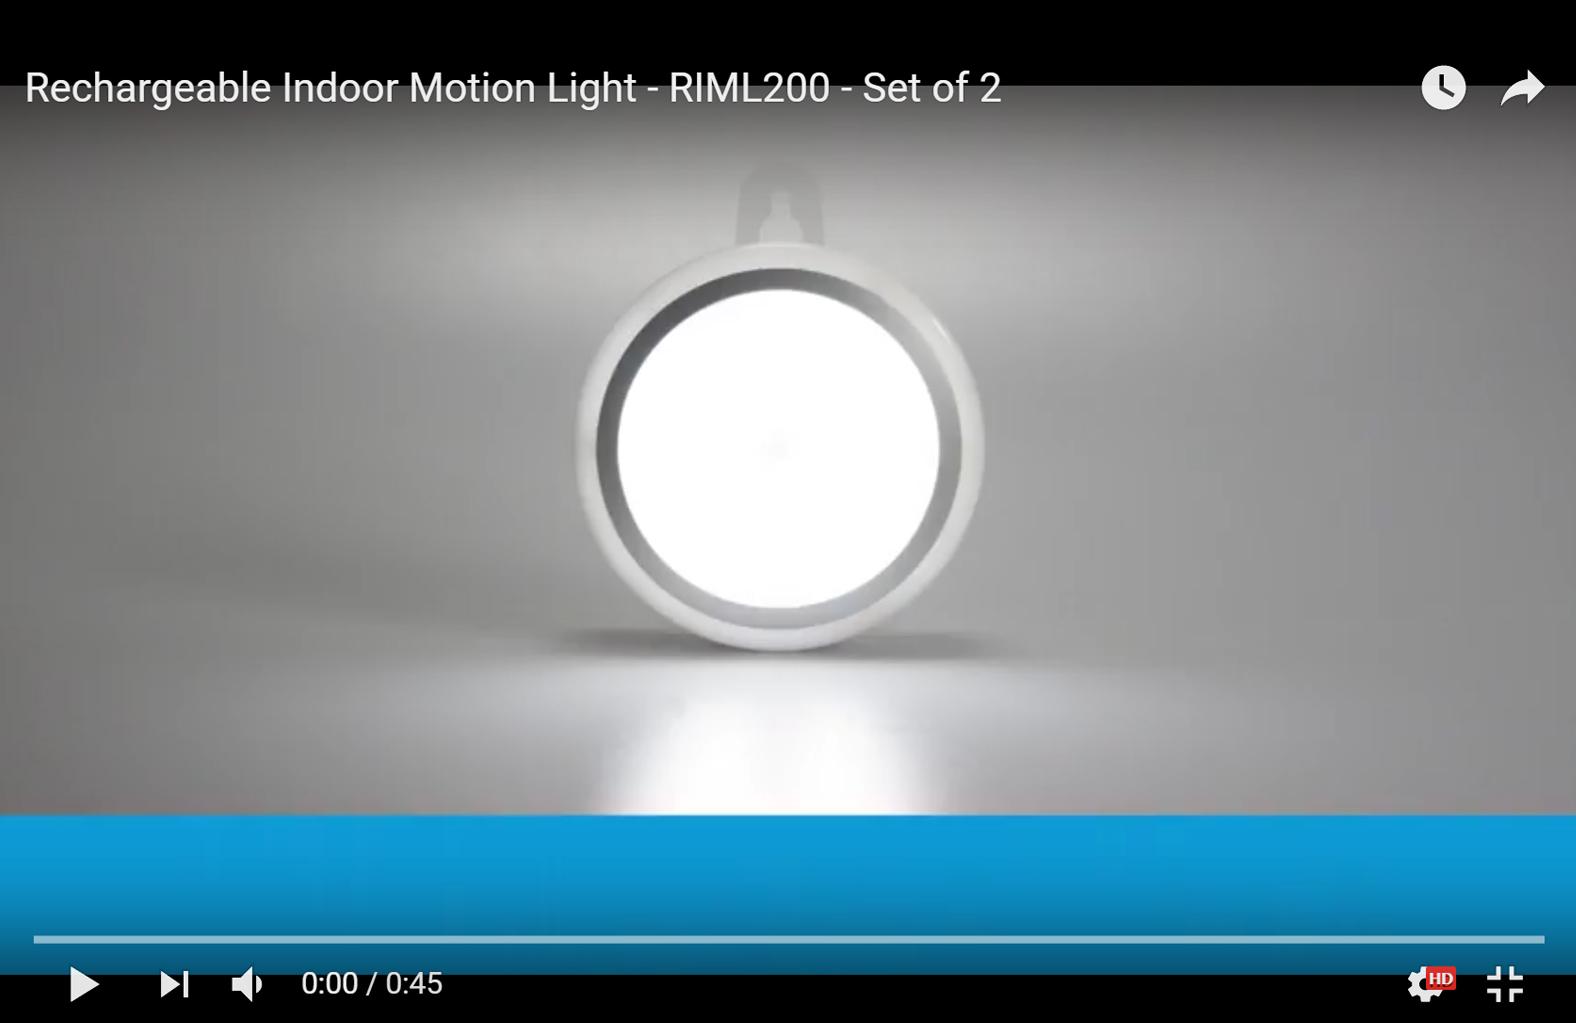 http://ibood.link/gfx/dreamled-video.jpg